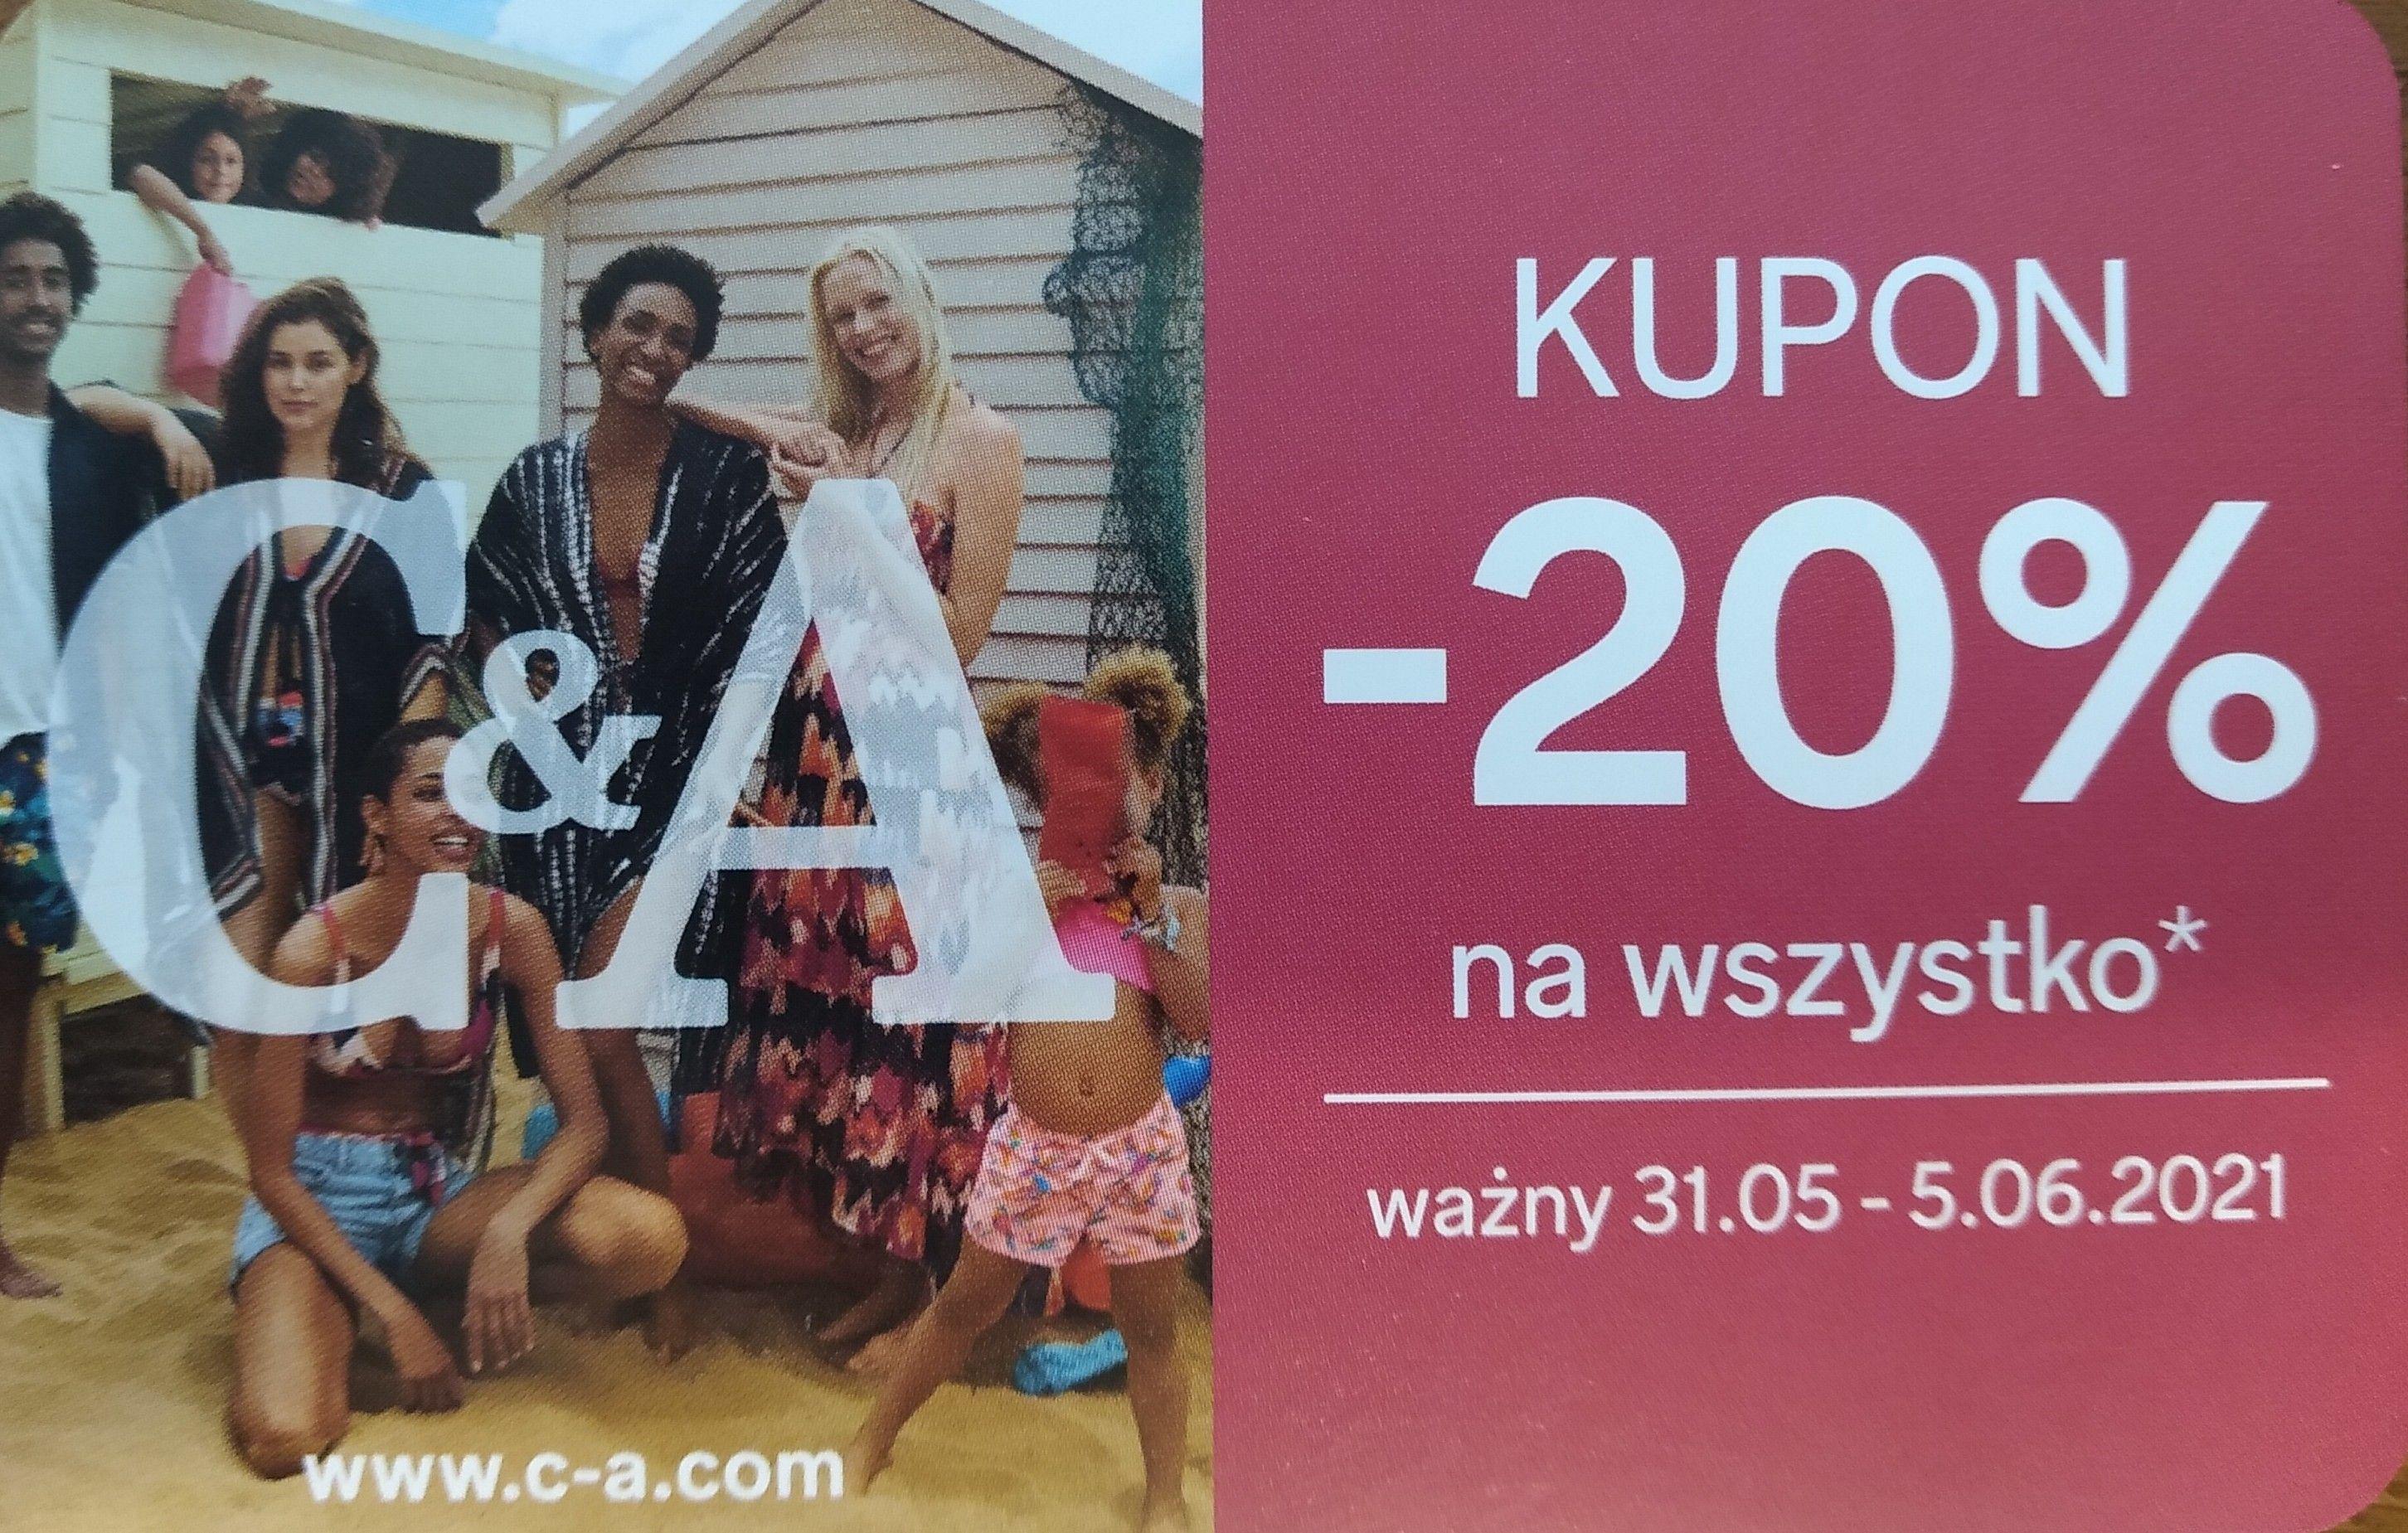 Kupon rabatowy -20% - C&A